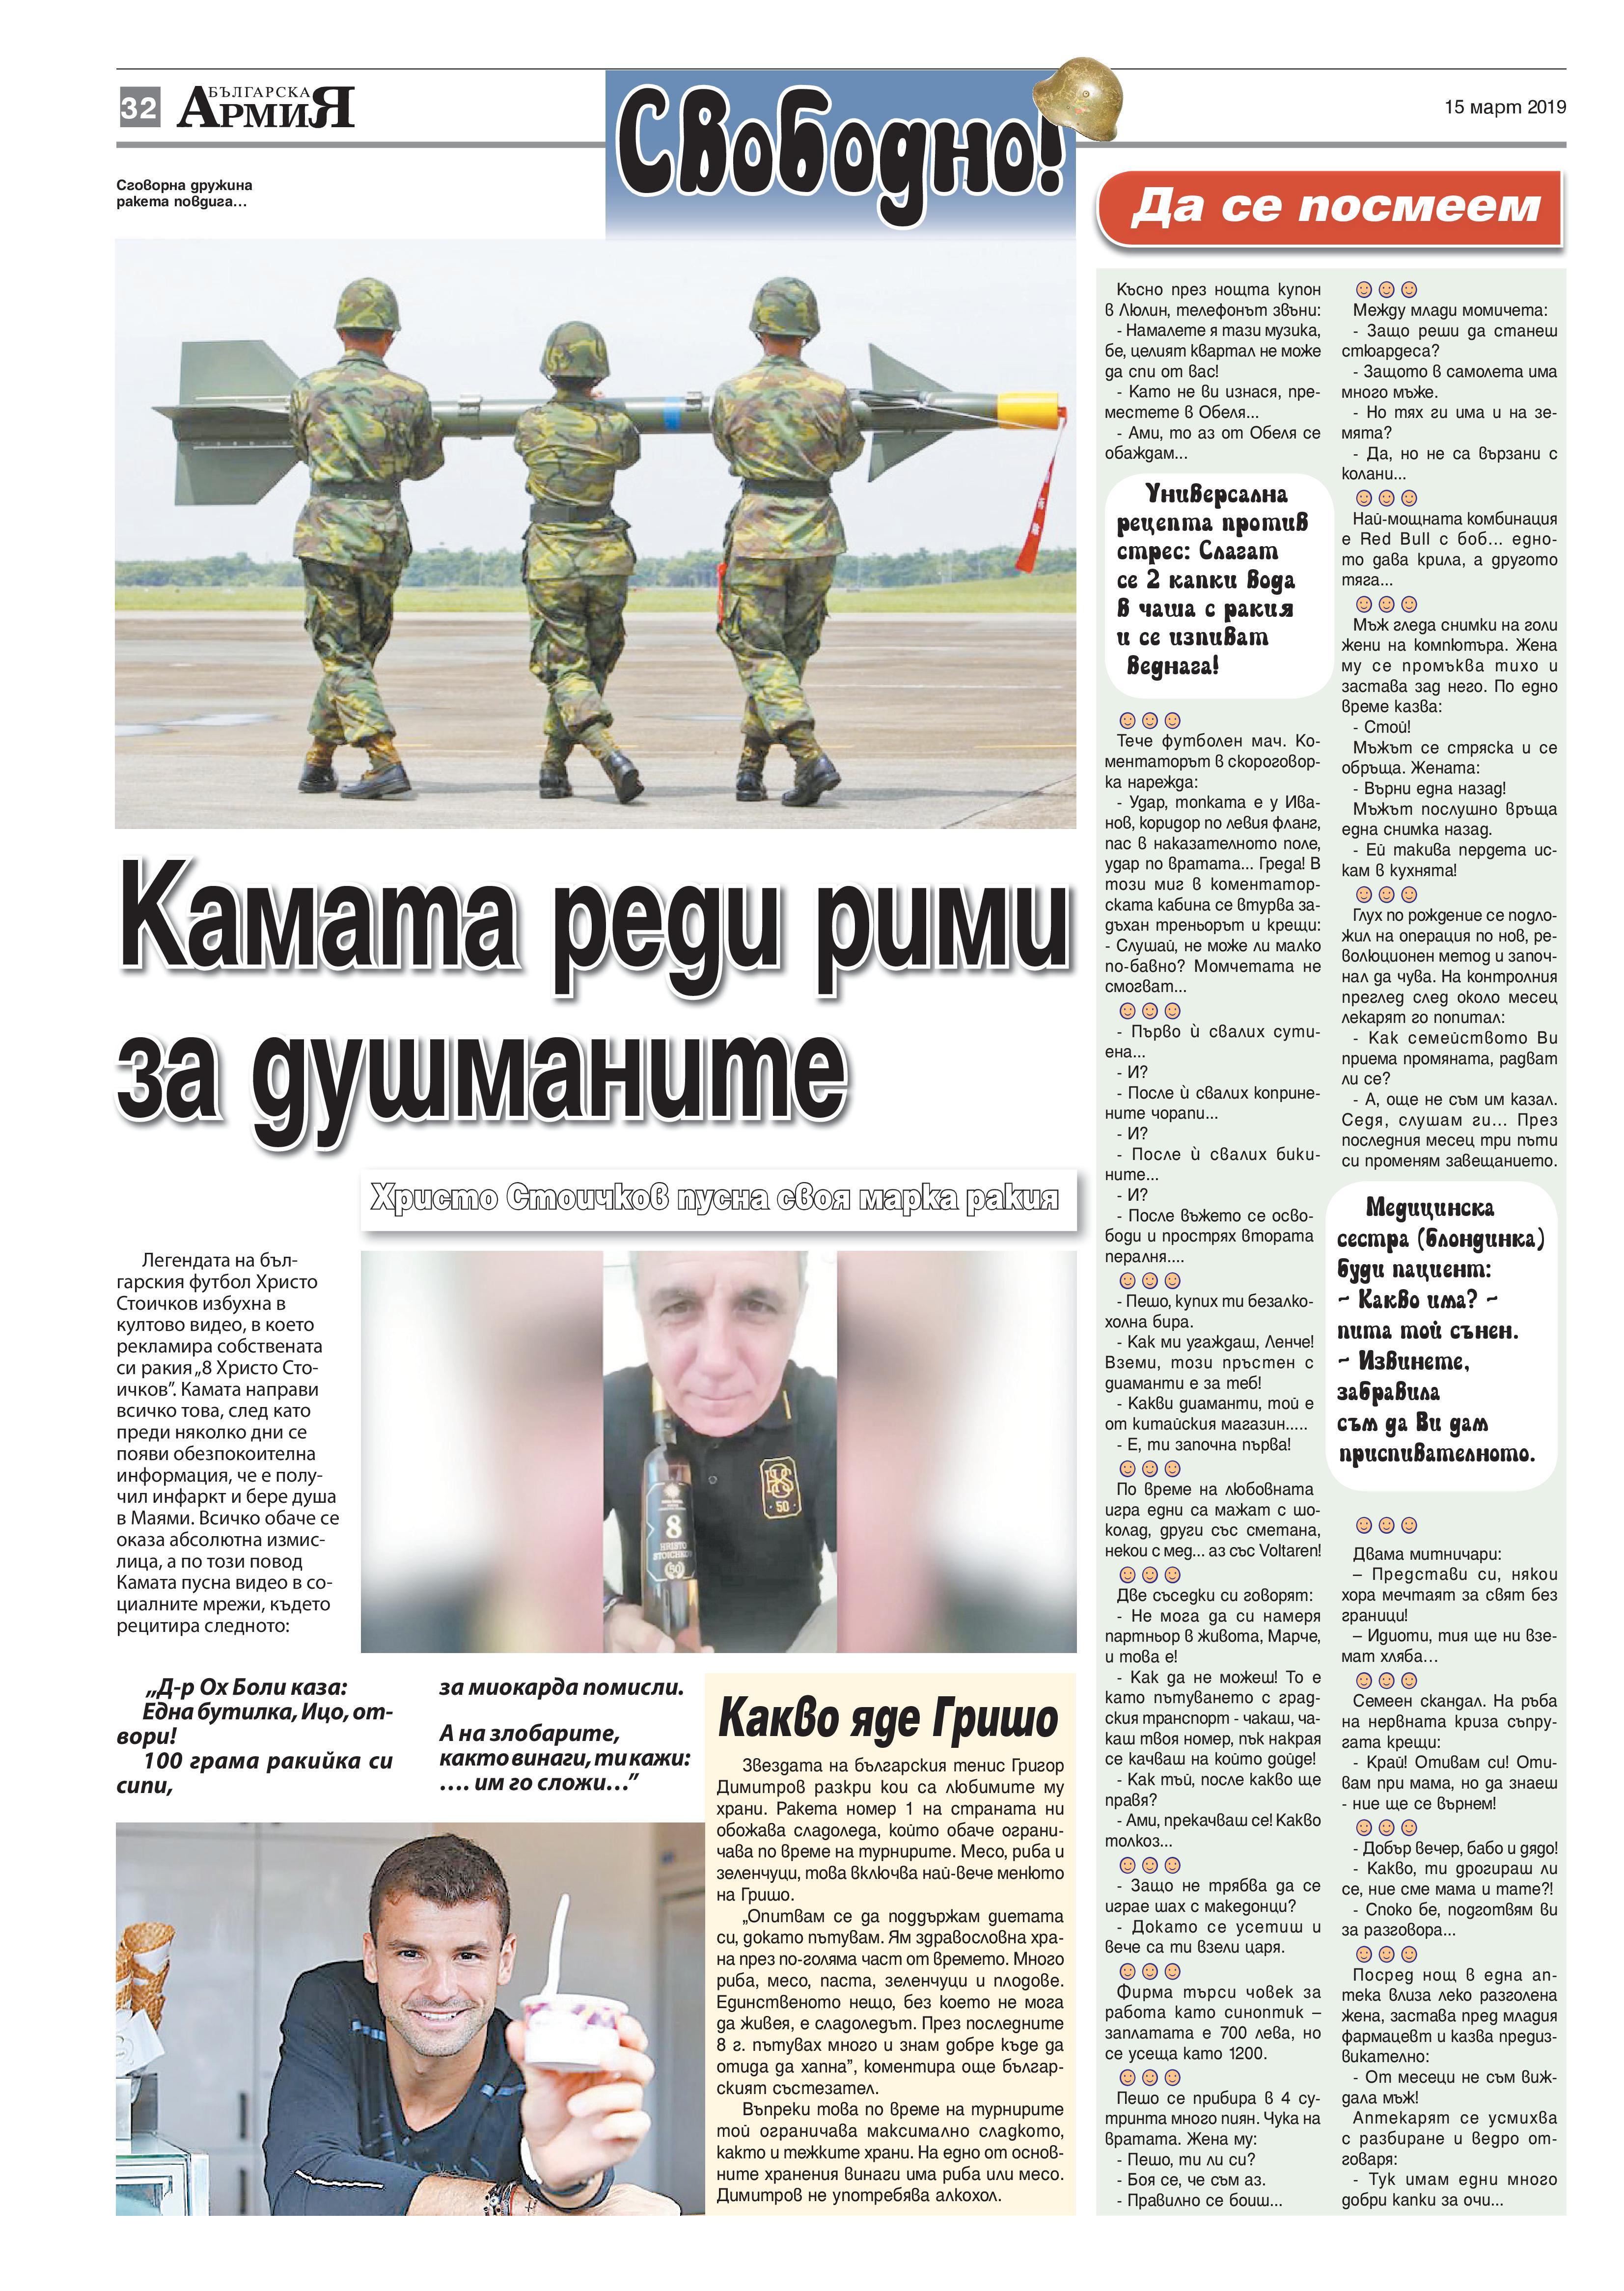 https://www.armymedia.bg/wp-content/uploads/2015/06/32-25.jpg